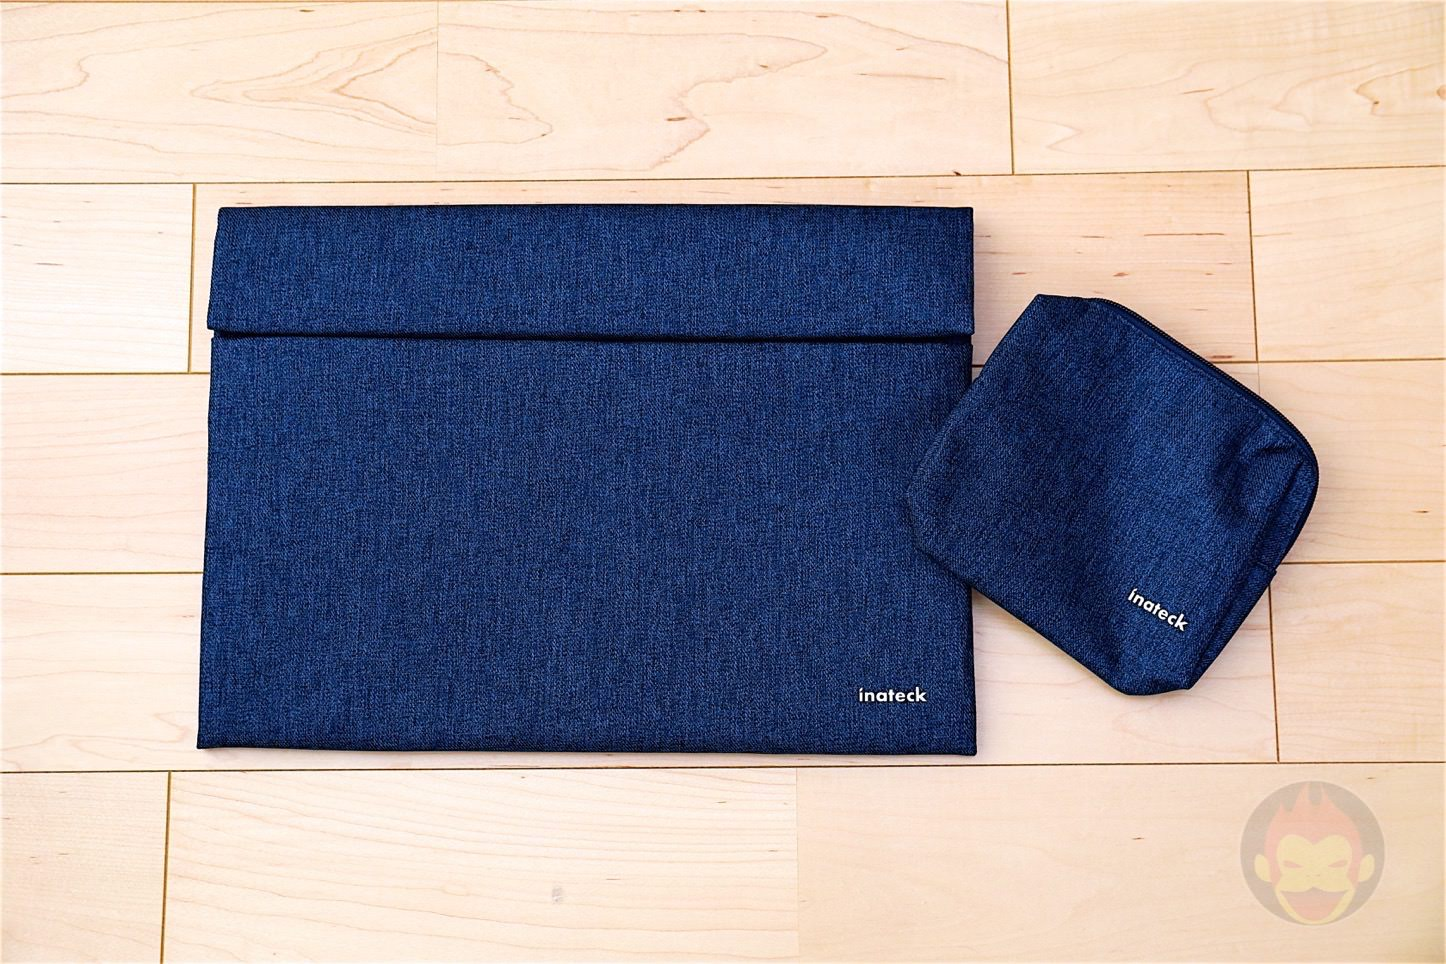 Inateck-MacBookPro15-Case-Review-02.jpg